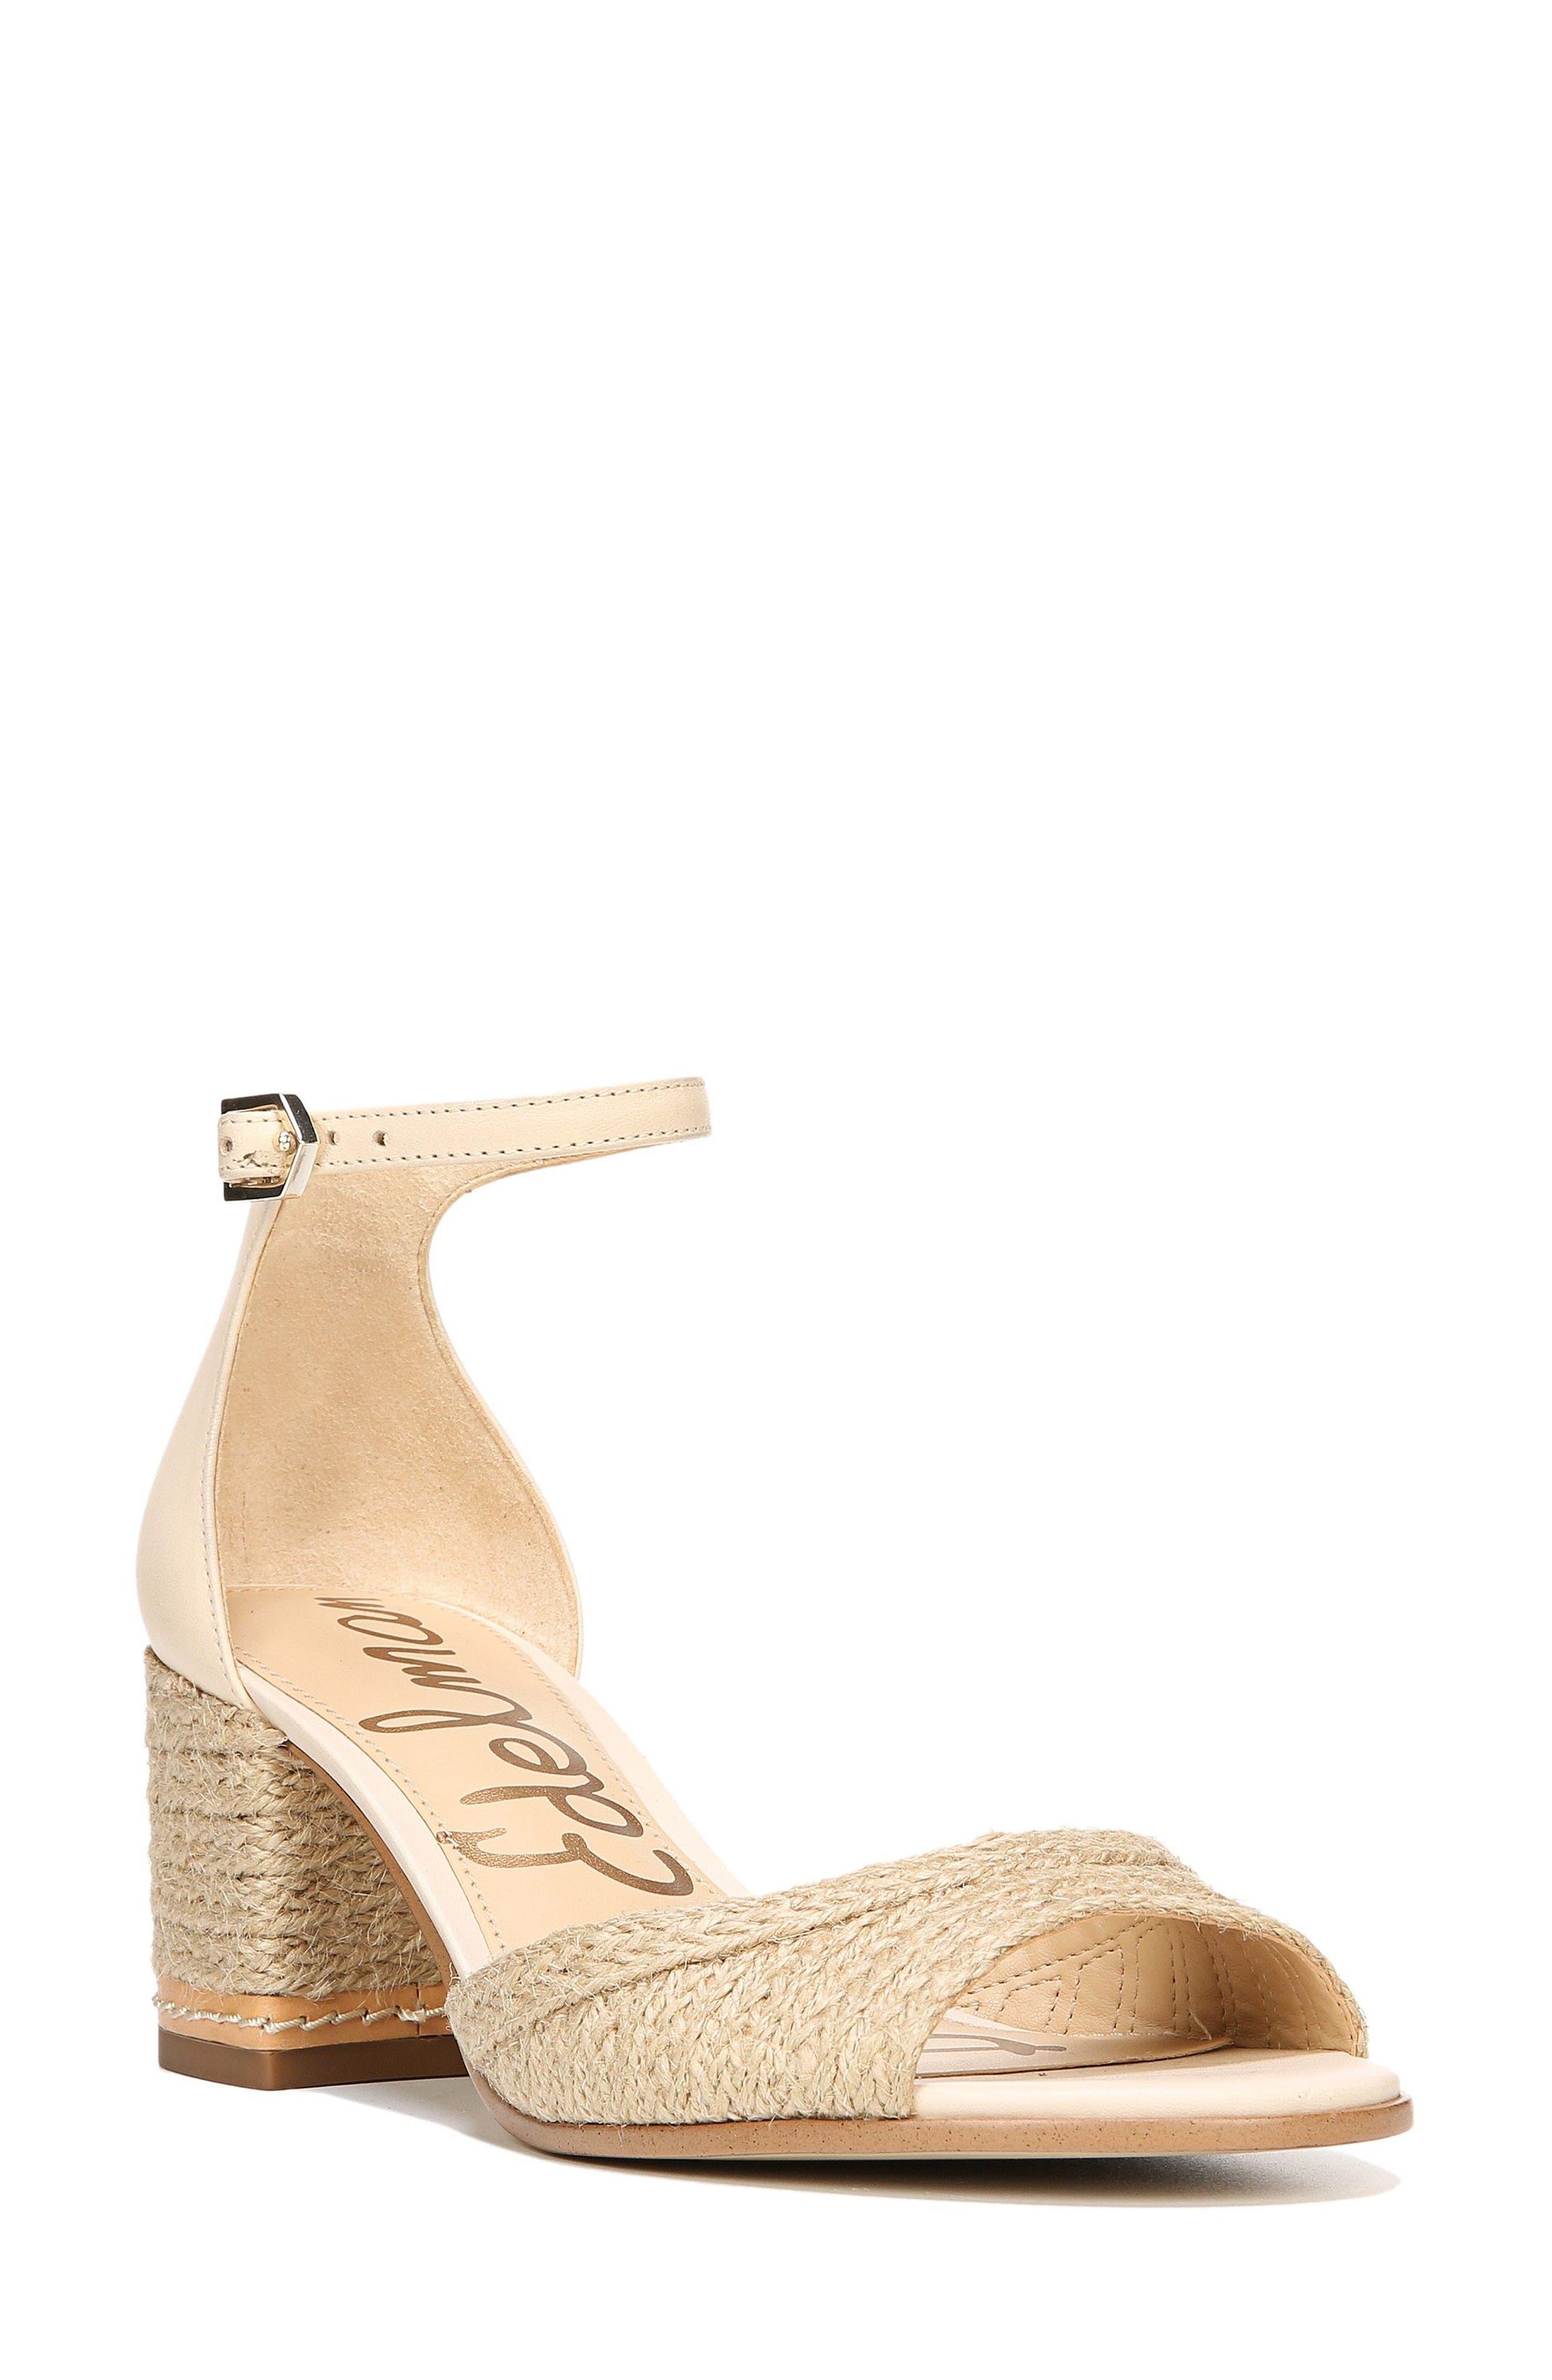 Main Image - Sam Edelman Susie 2 Ankle Strap Sandal (Women)